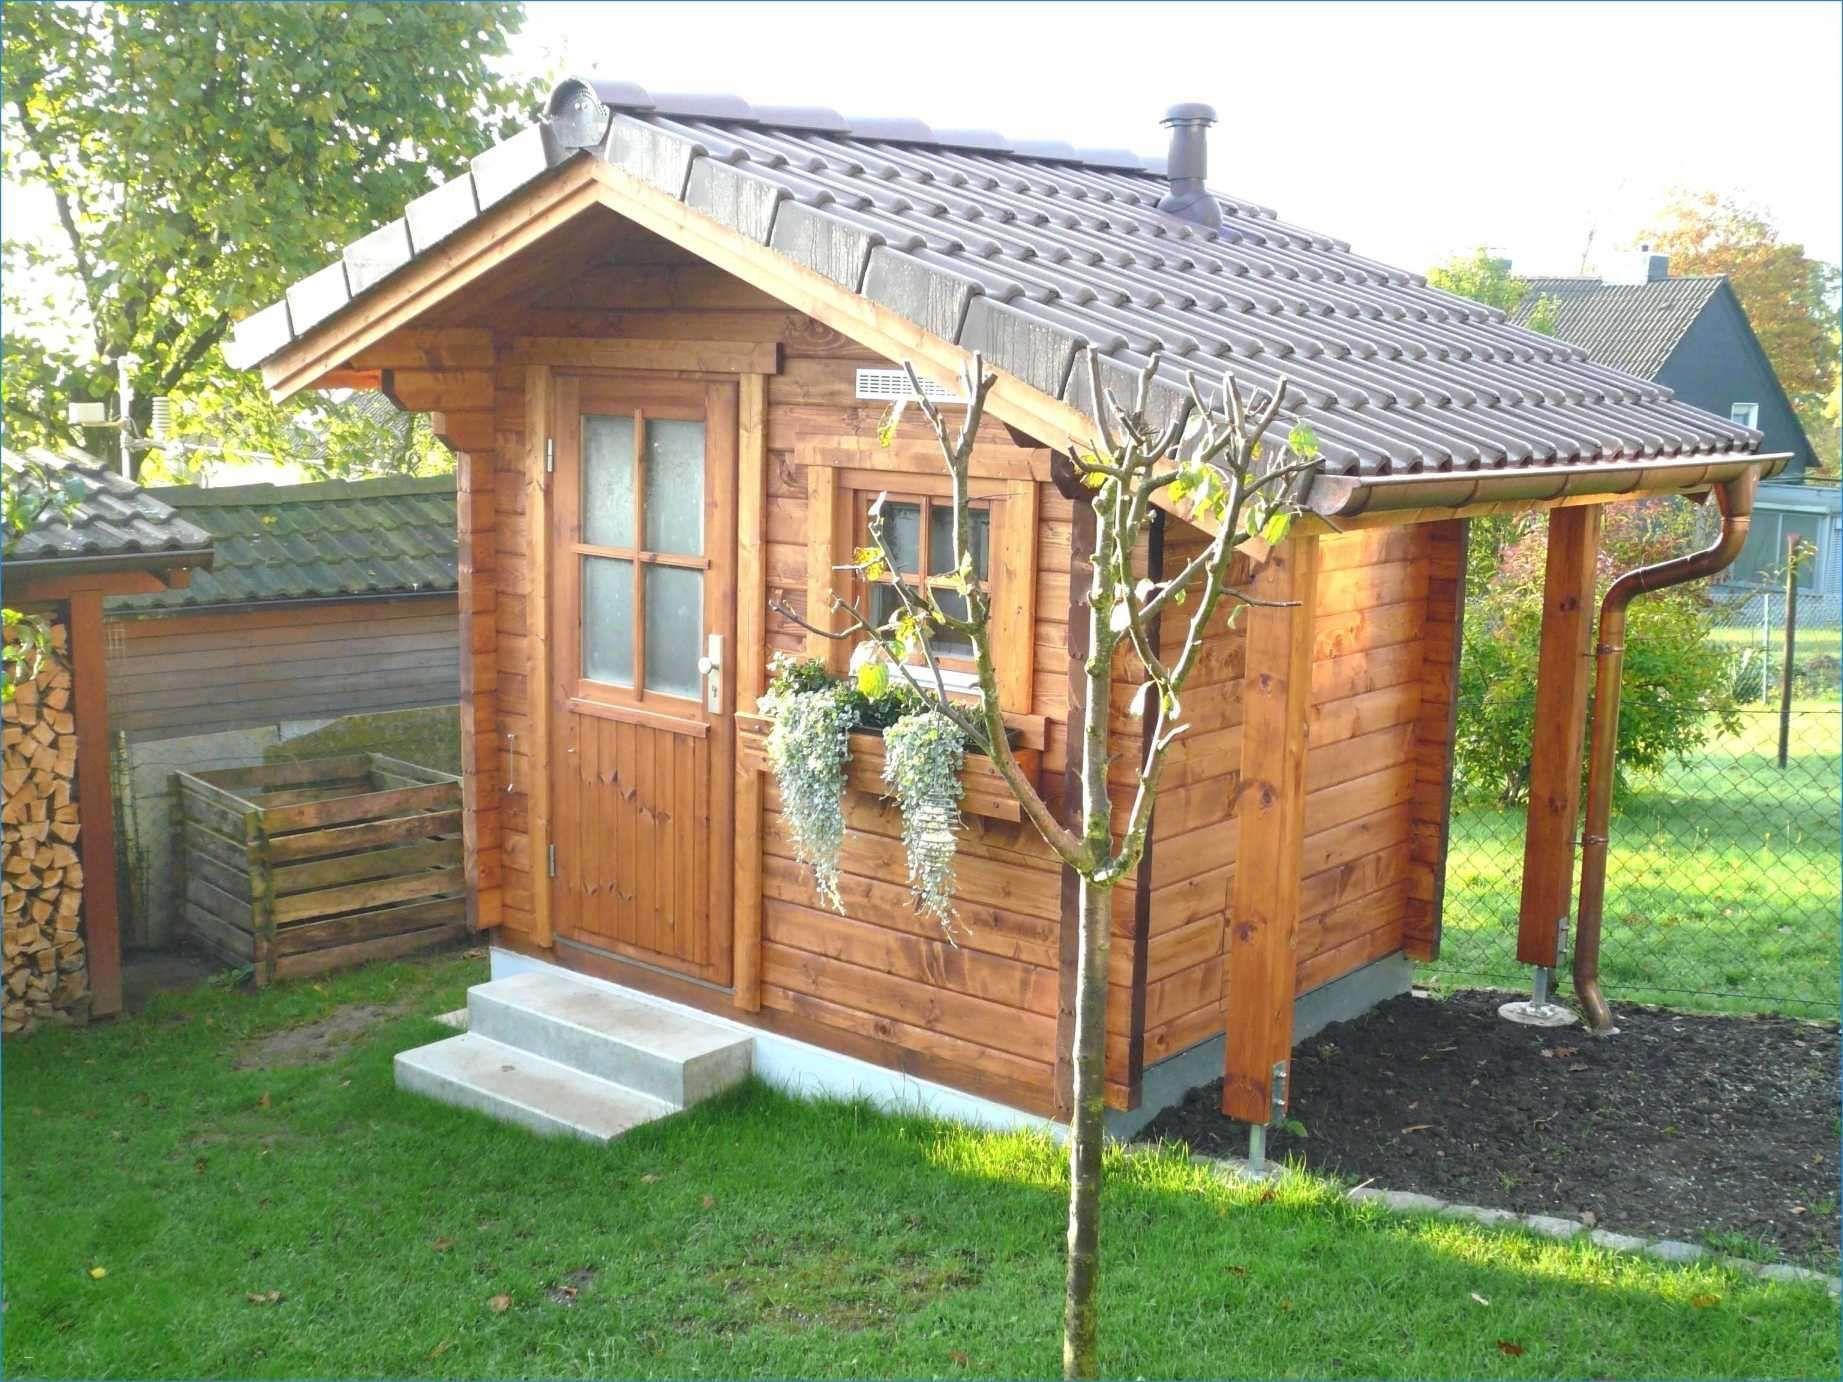 39 Neu Spielhaus Garten Gebraucht Shed Outdoor Structures House Styles